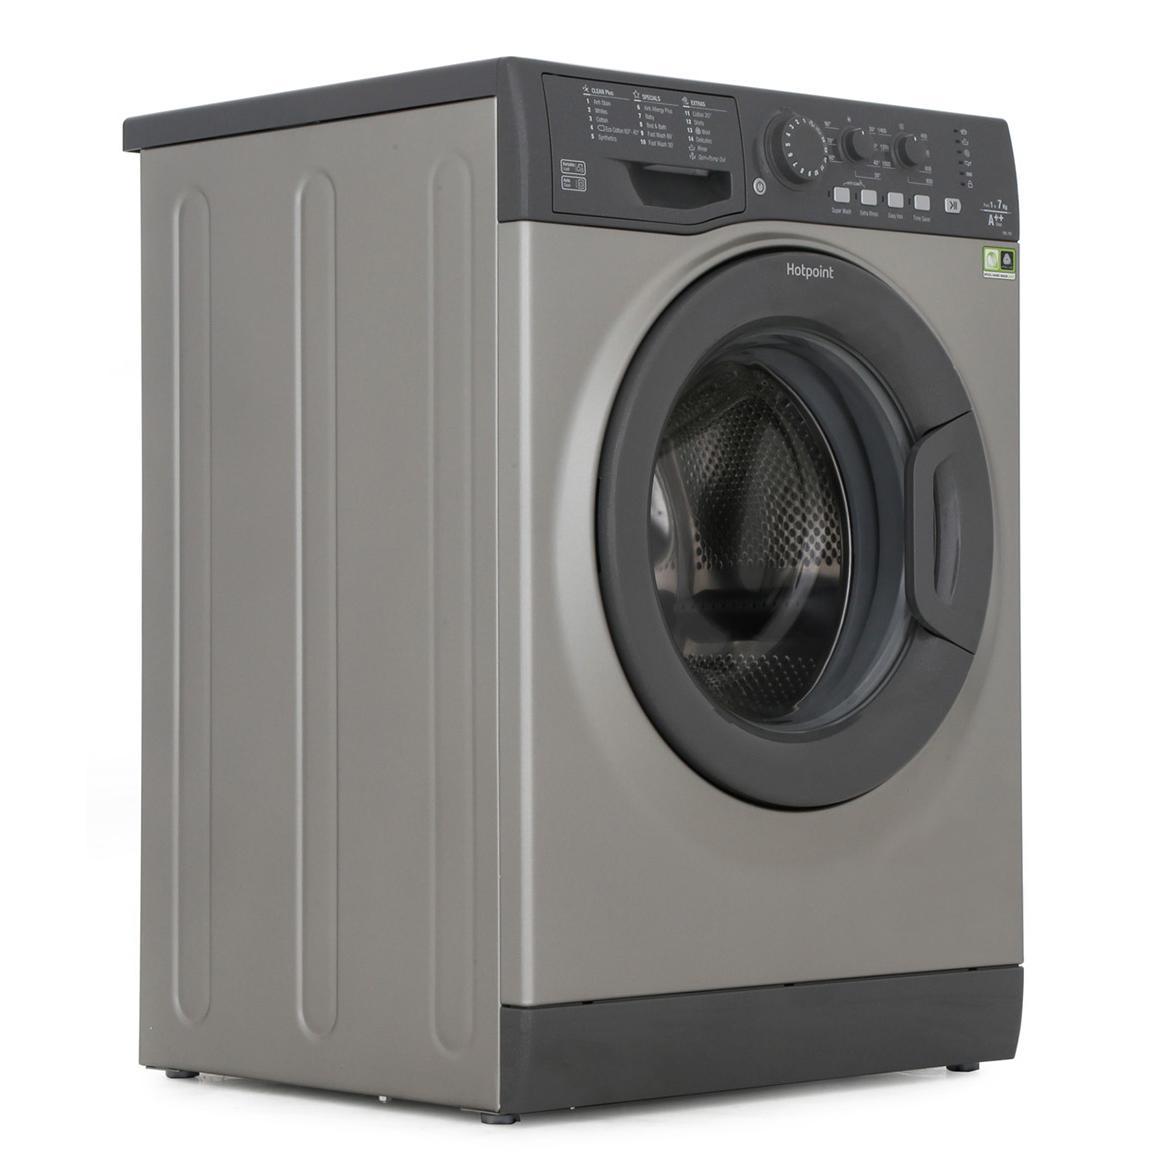 Hotpoint FML 742 G UK Washing Machine